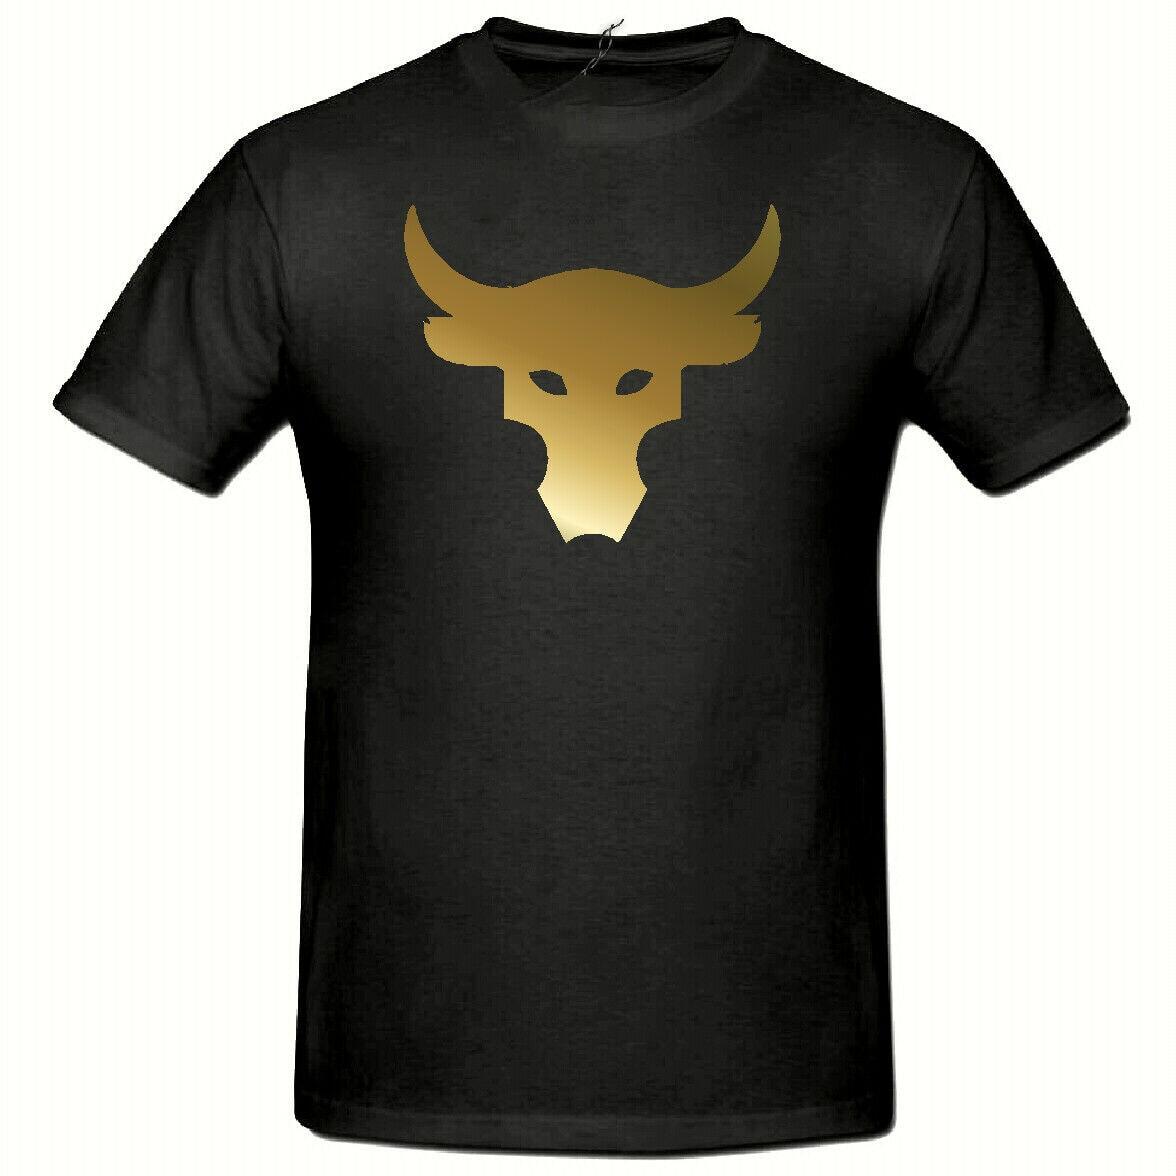 Brahma Bull Tshirt, The Rock Project Gym T Shirt Men Women Gold Slogan Tshirt Basic Models Tops Tee Shirt